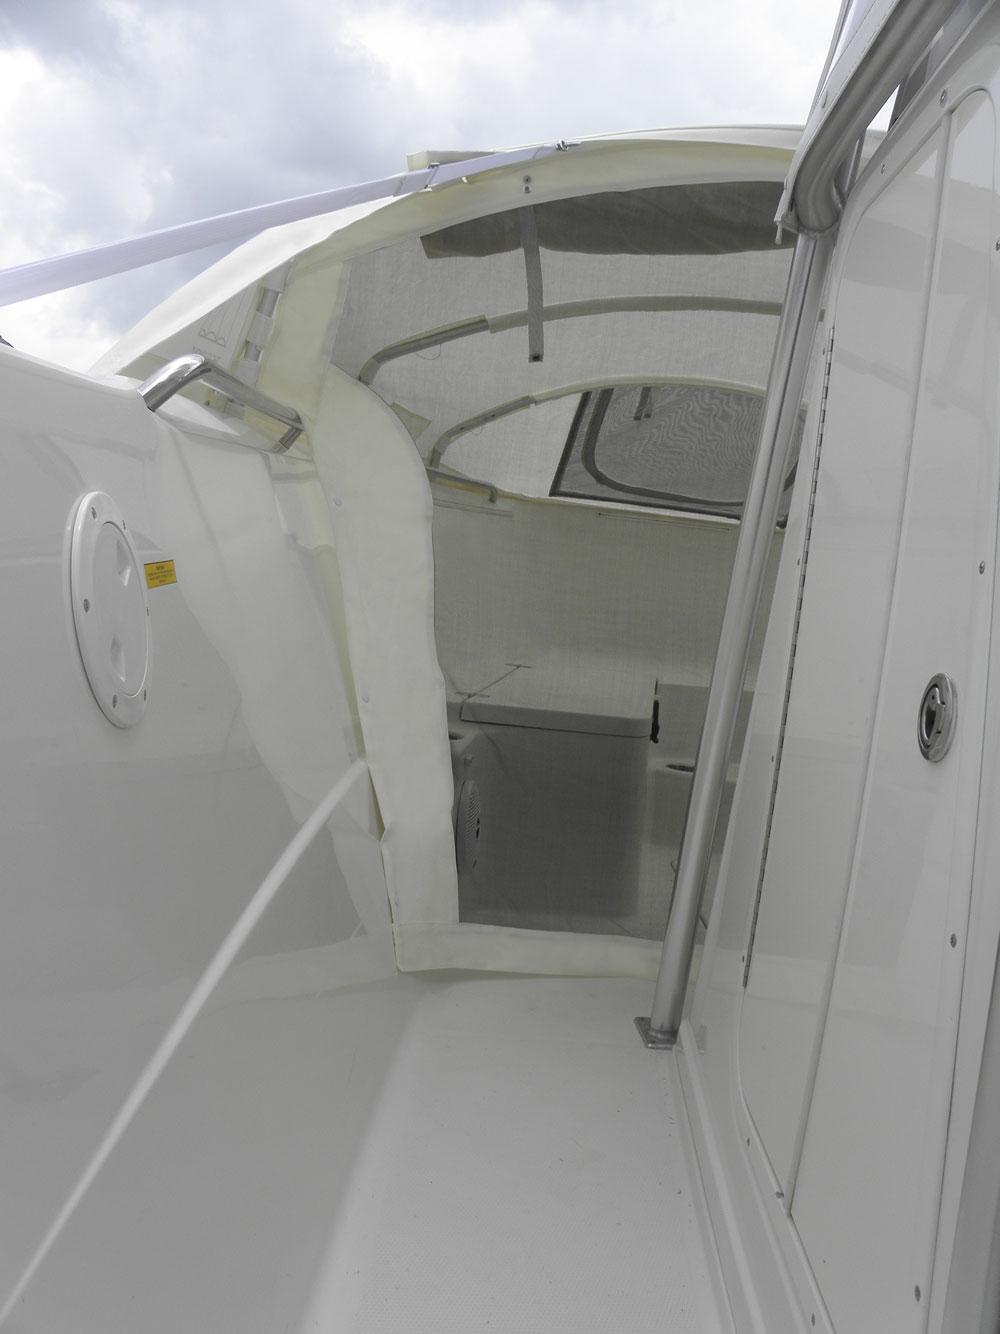 boat covers, boat canopy, bow dodger, boat bimini, bimini top, boat shade, boat tops, boat tent, console boat shade, bow shade, boat tent, center console boat, prefab instant cabin